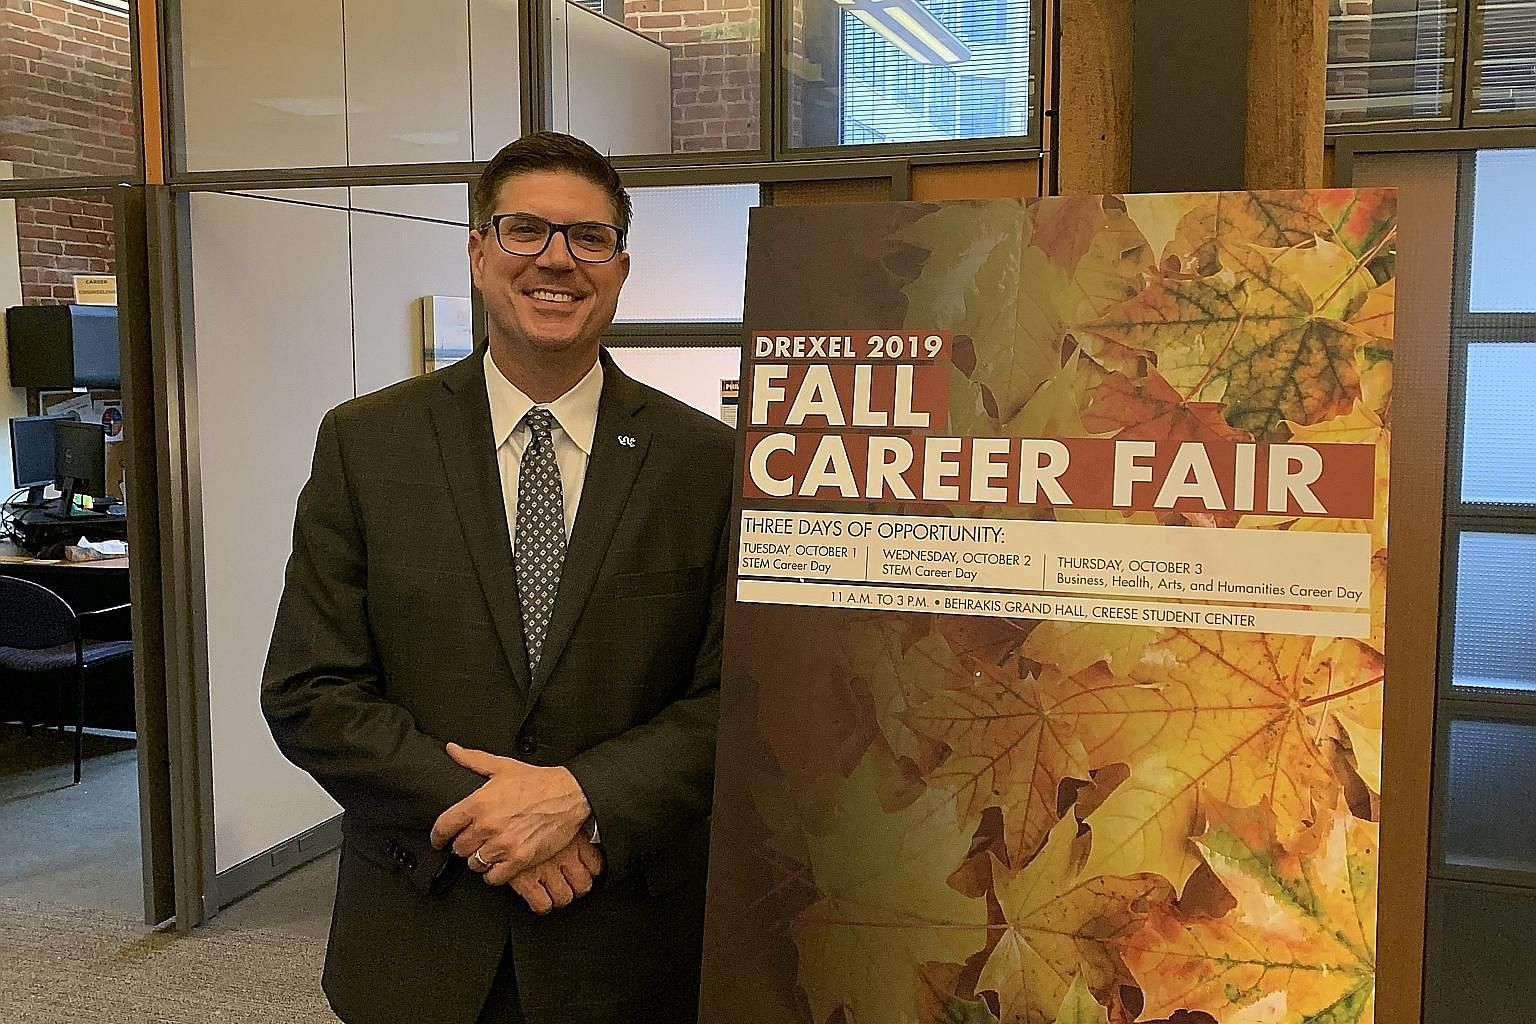 Mr Ian Sladen, vice-president of cooperative education and career development at Drexel University in the United States. ST PHOTO: SANDRA DAVIE